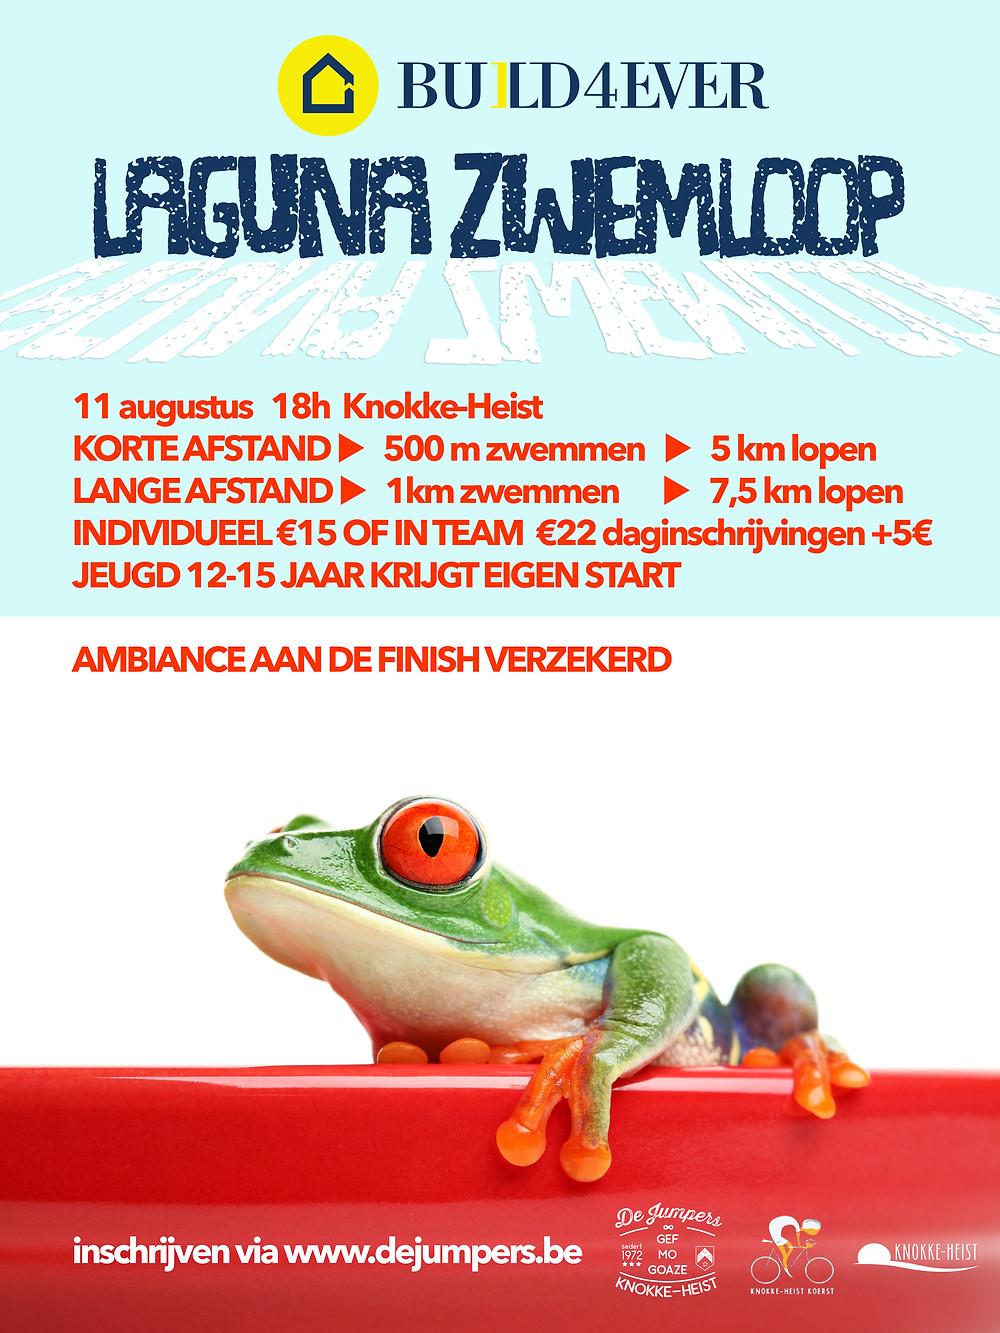 Build4ever Laguna Zwemloop